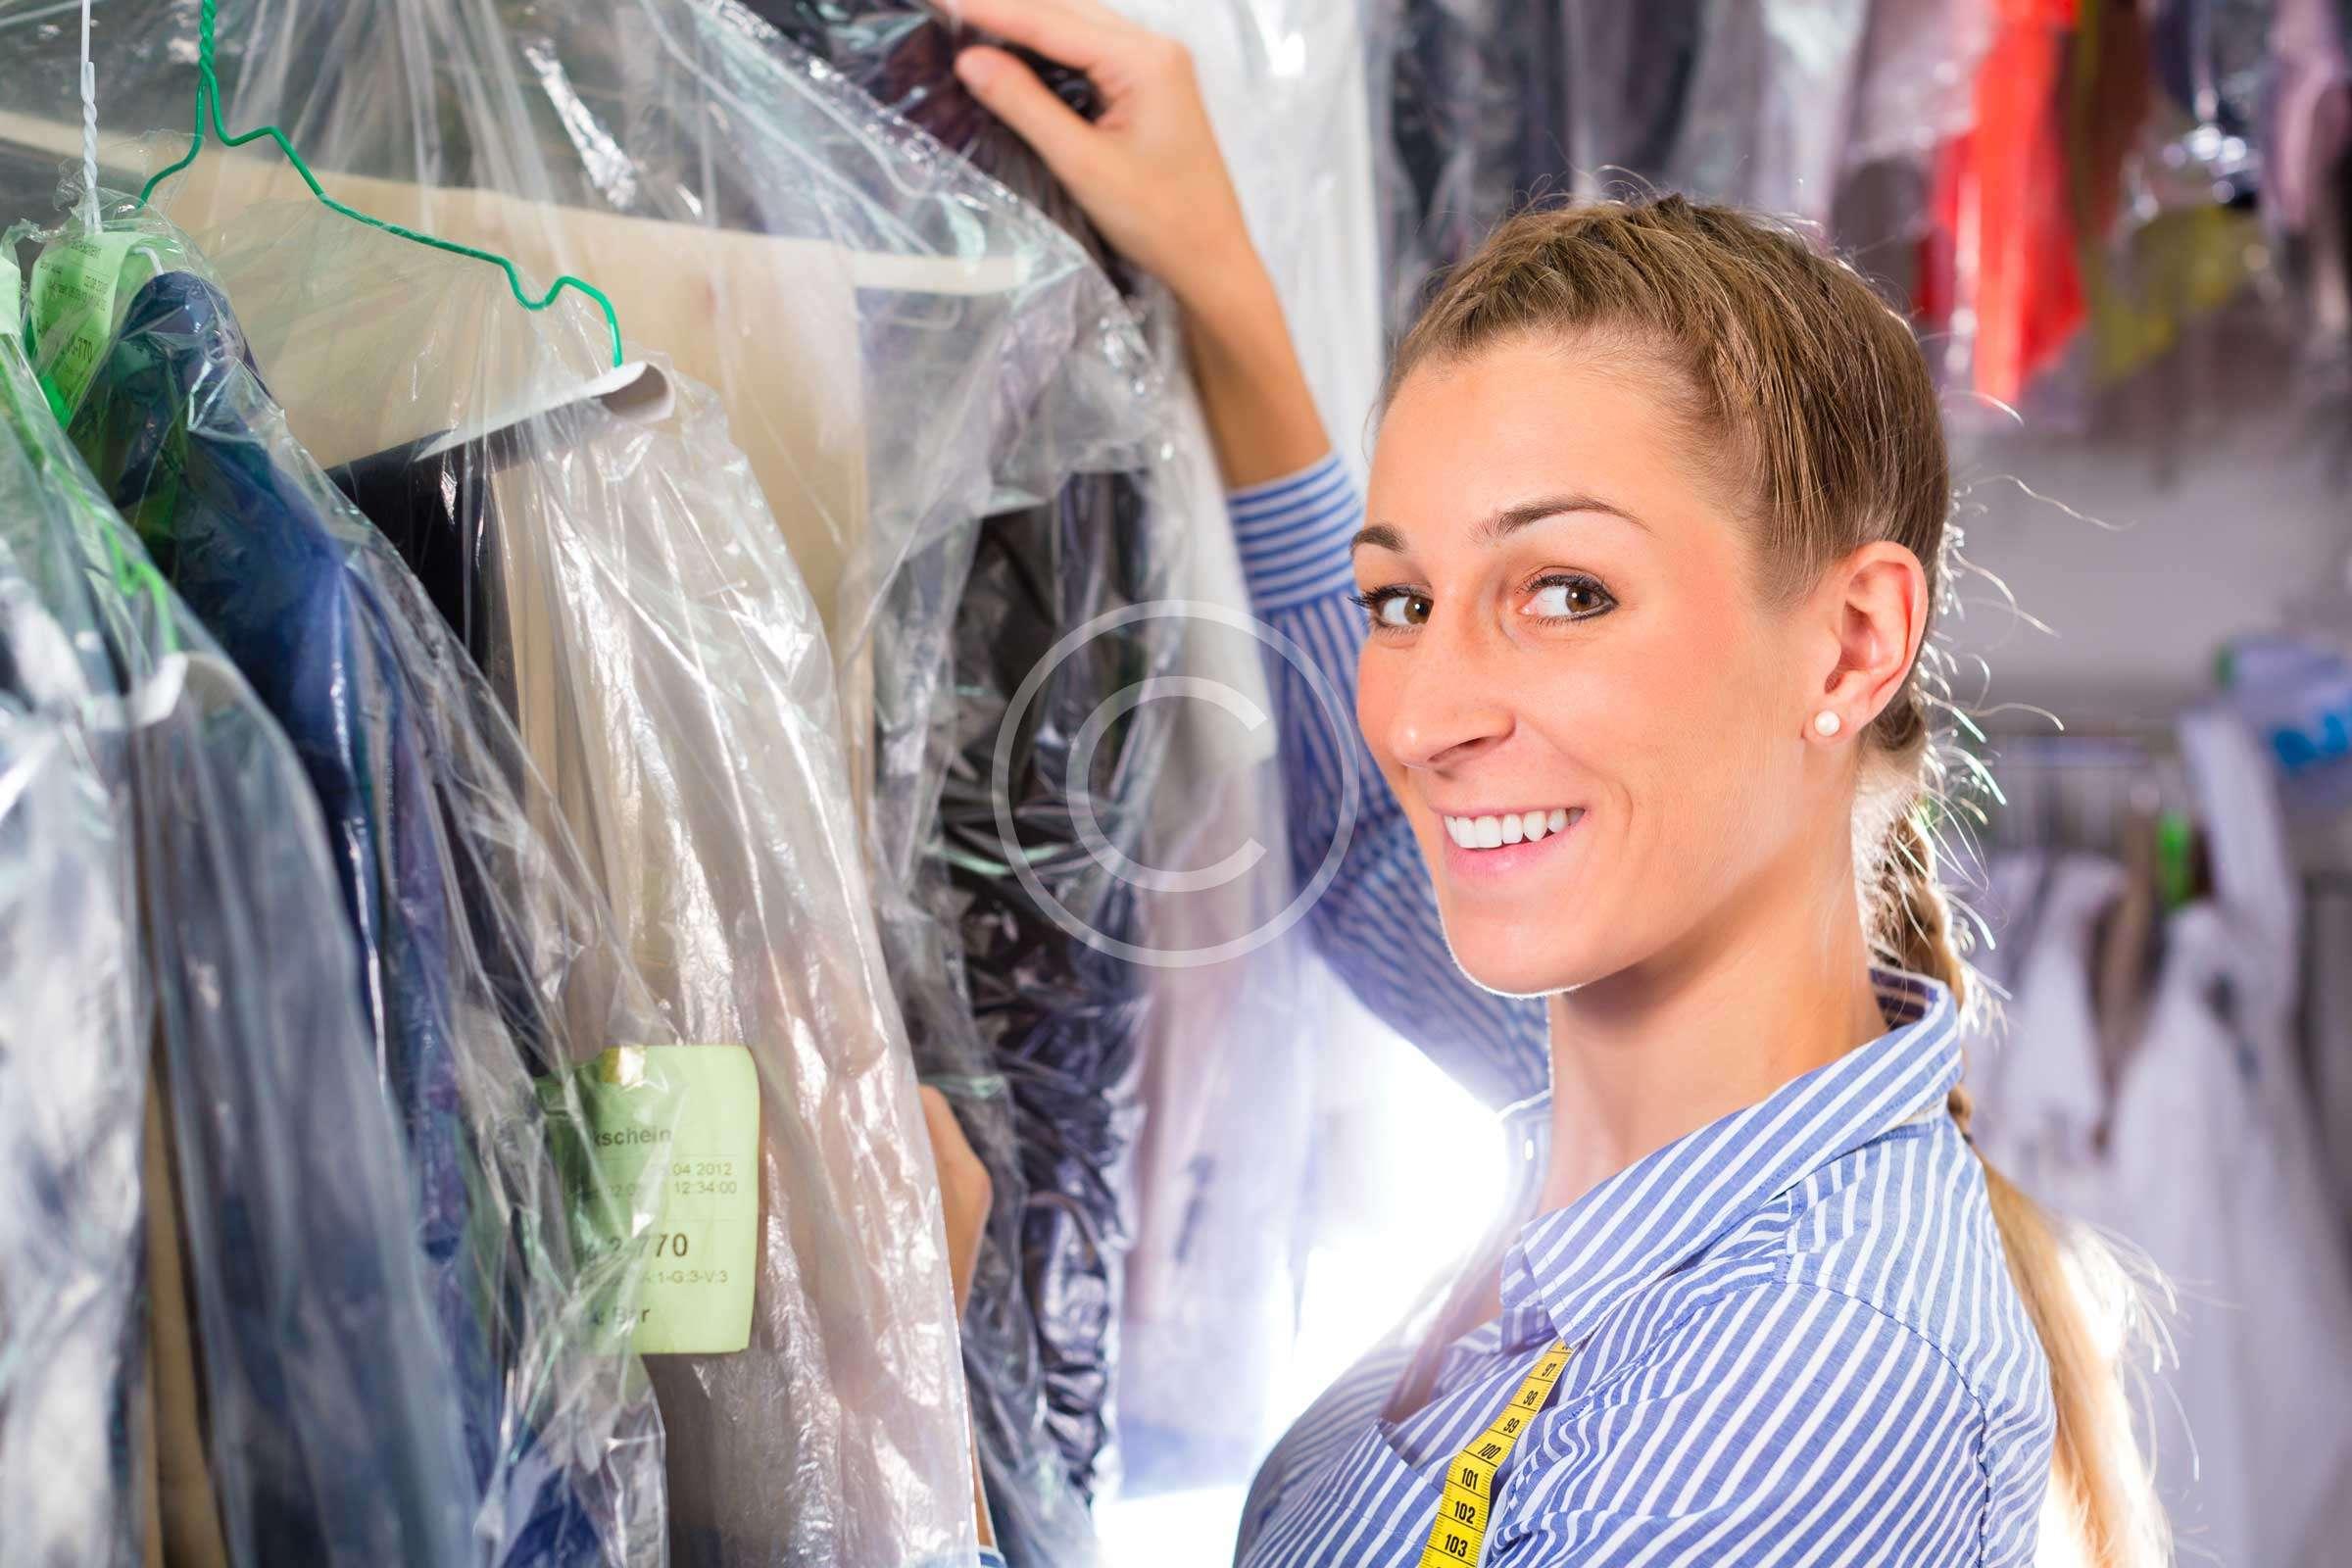 Clean clothes company